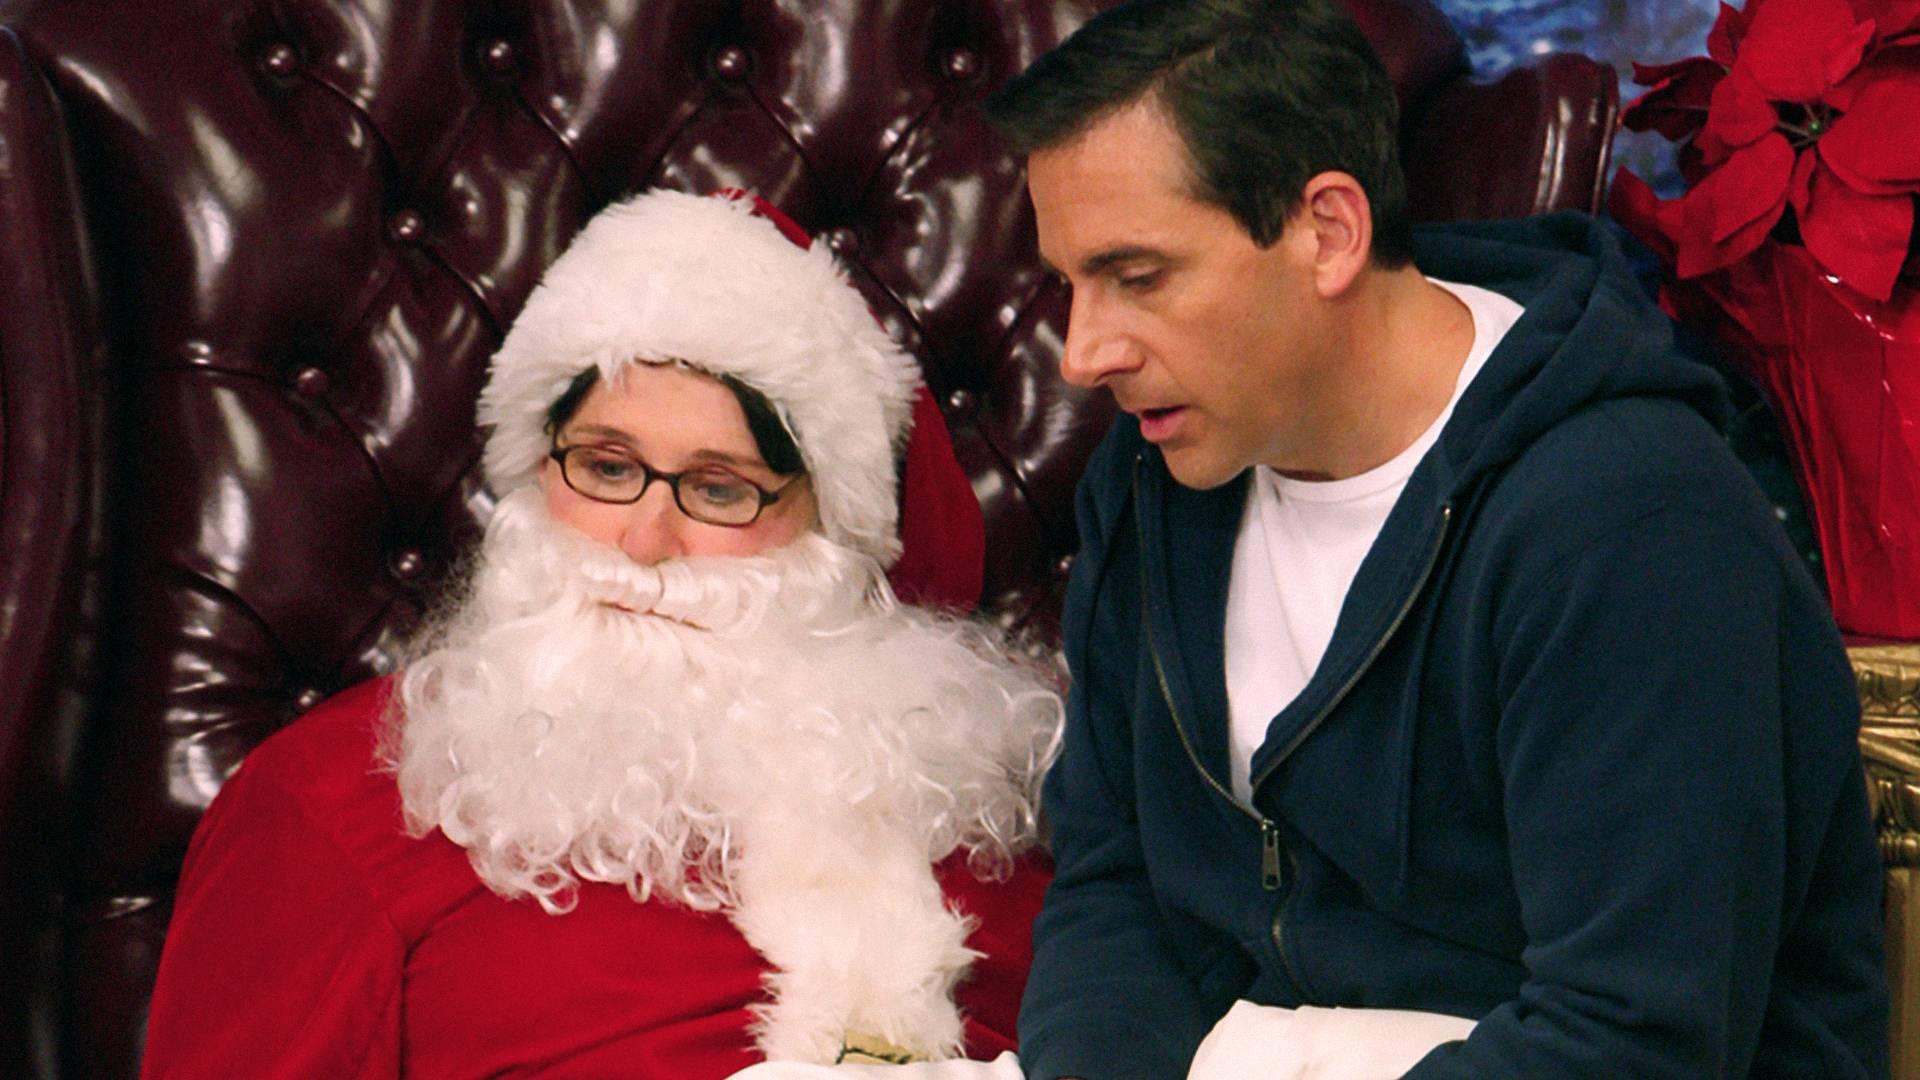 The Office Season 6 Episode 13